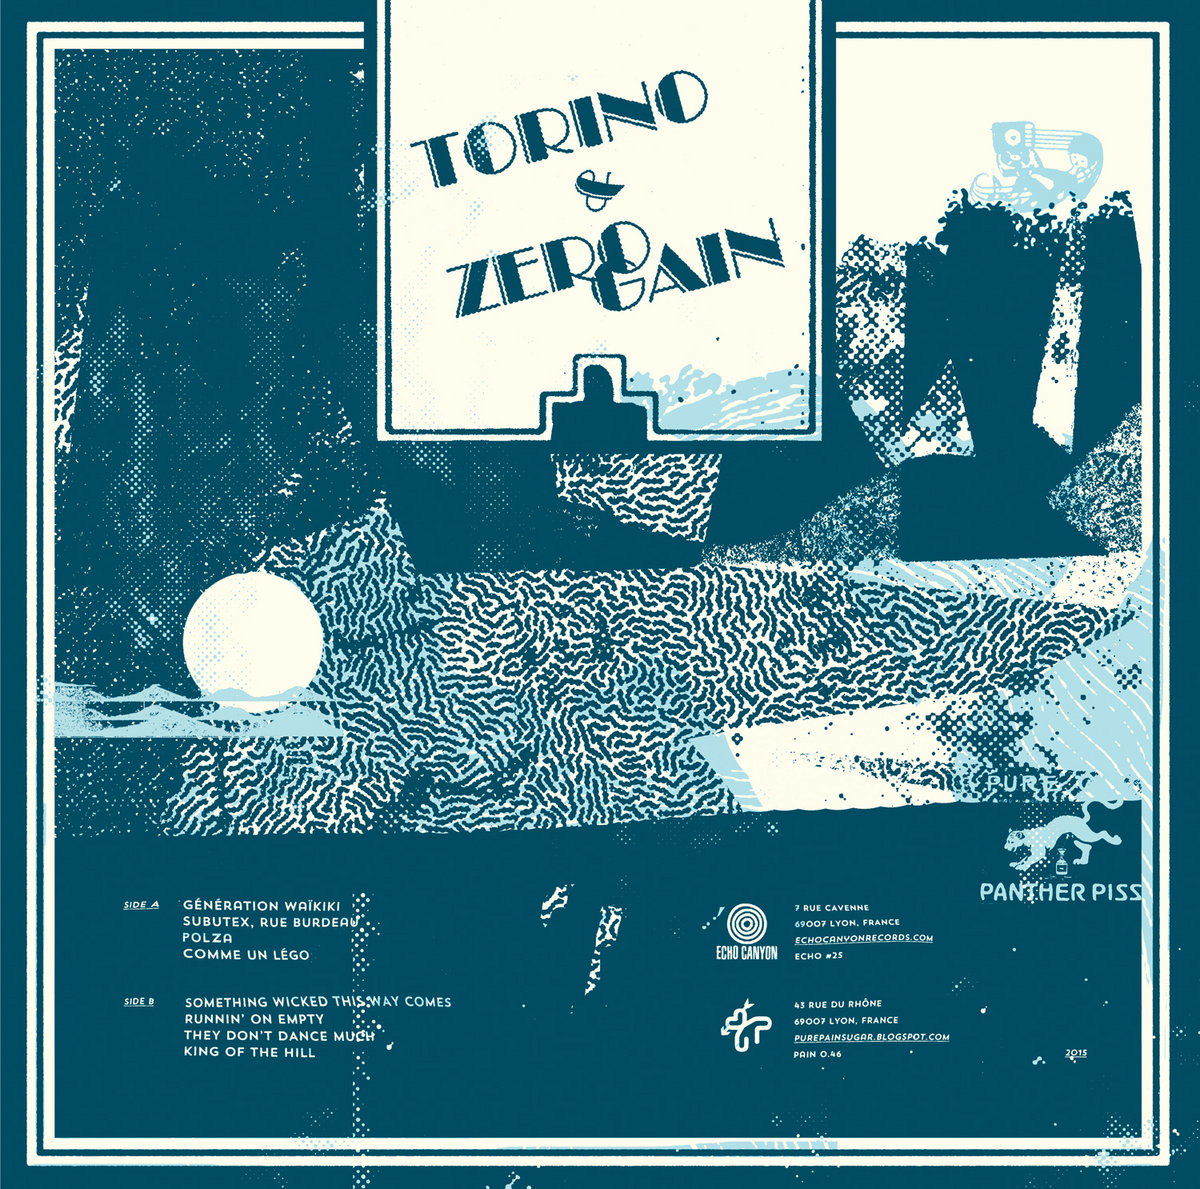 ECHO 025 TORINO / ZERO GAIN